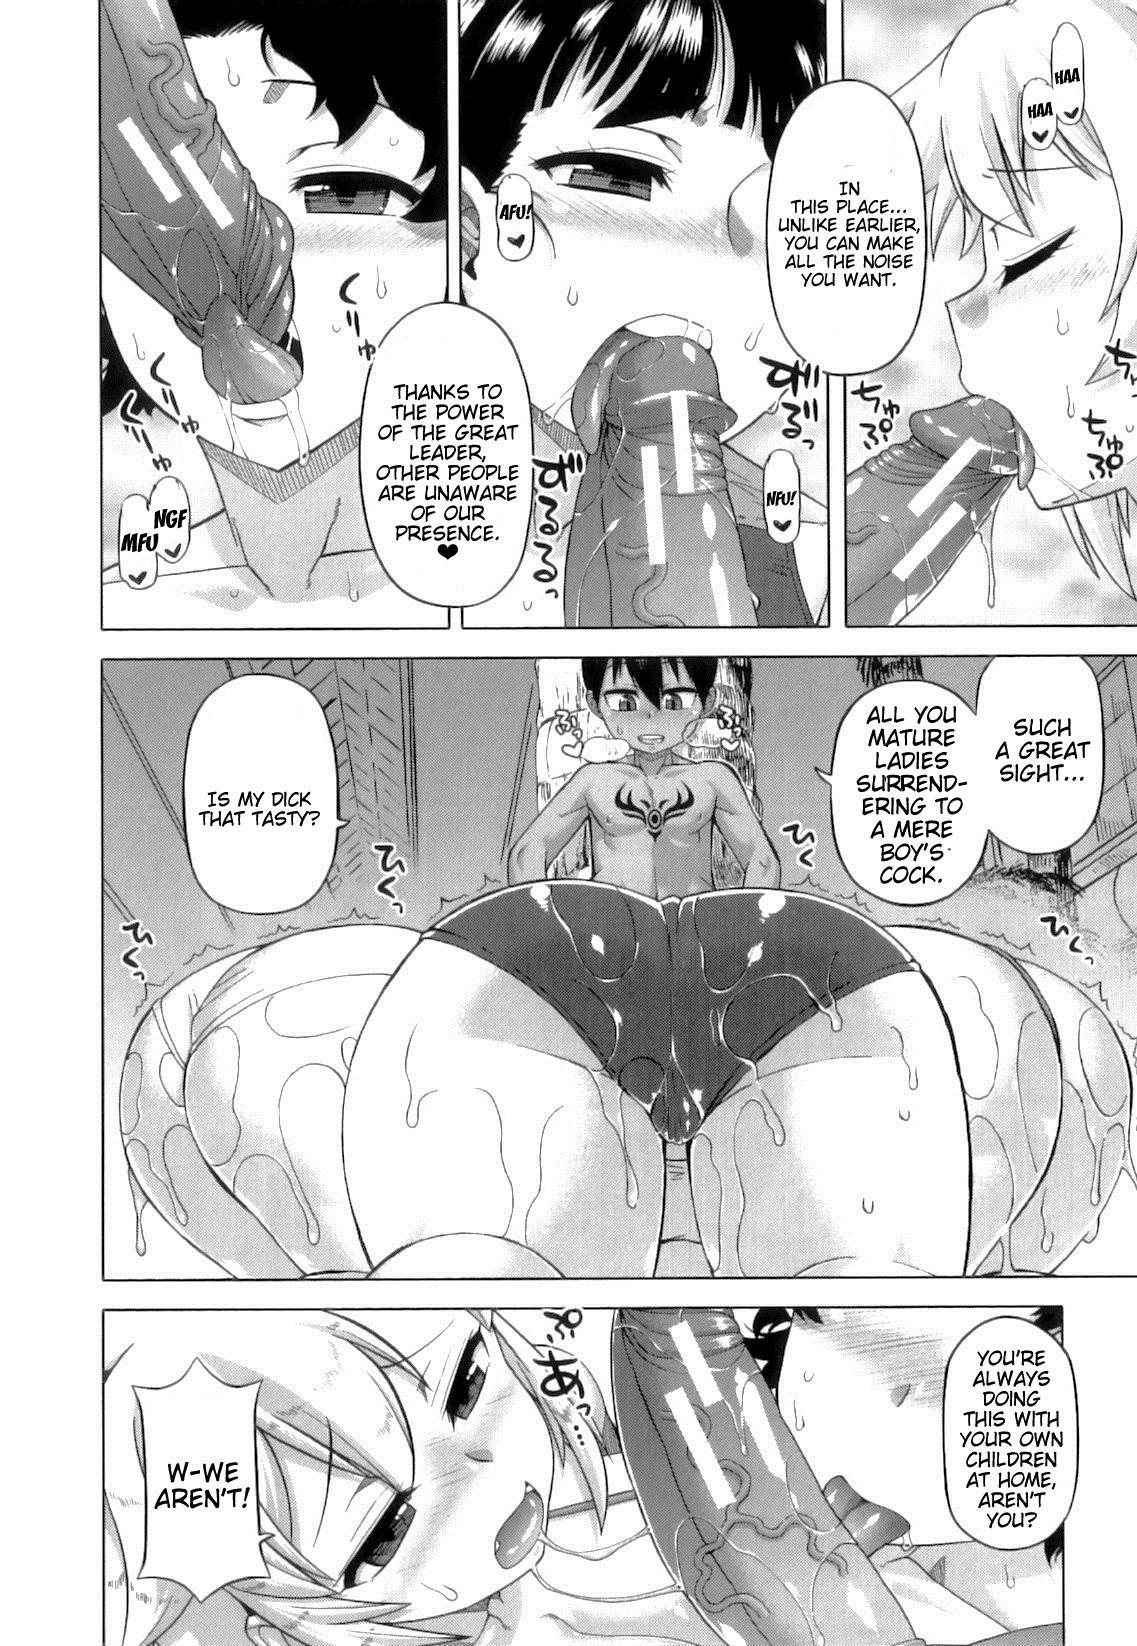 Snow Knight Whitey 131